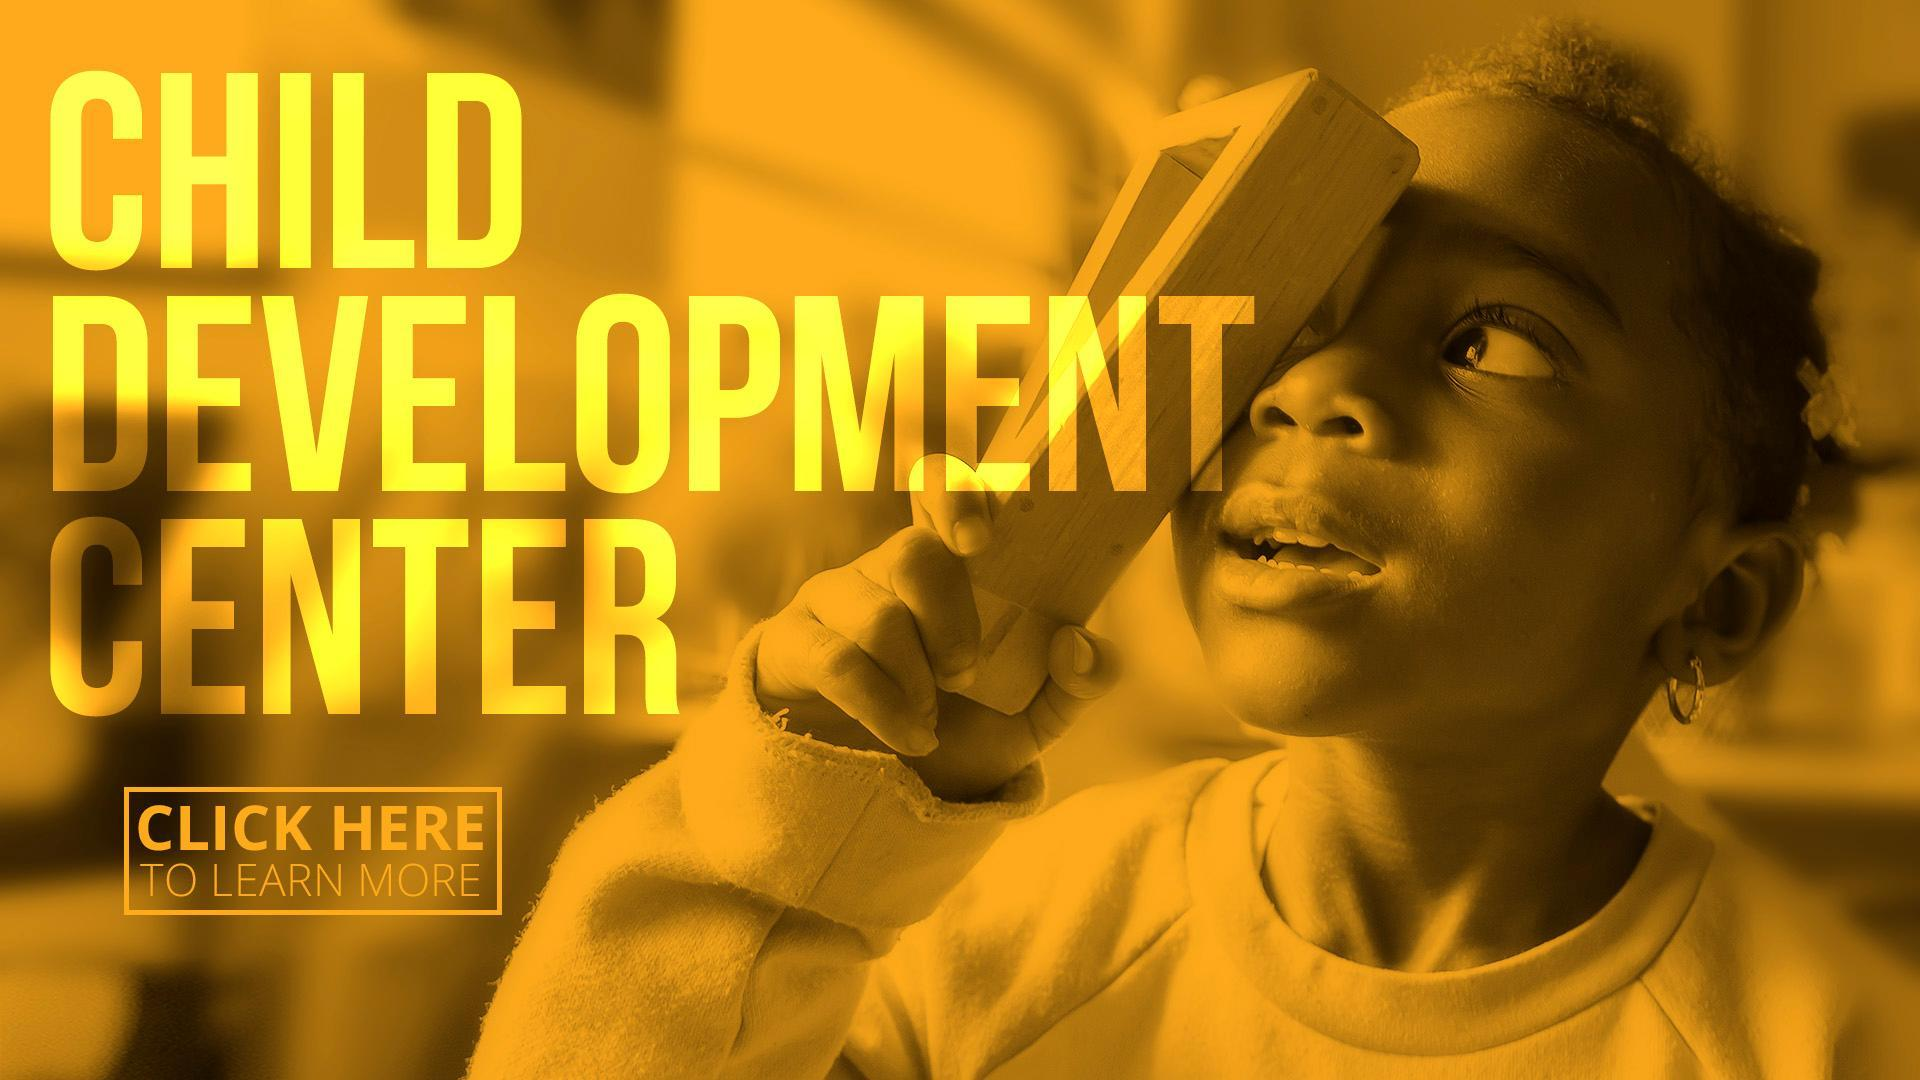 Child Development Center. Click here to learn more.